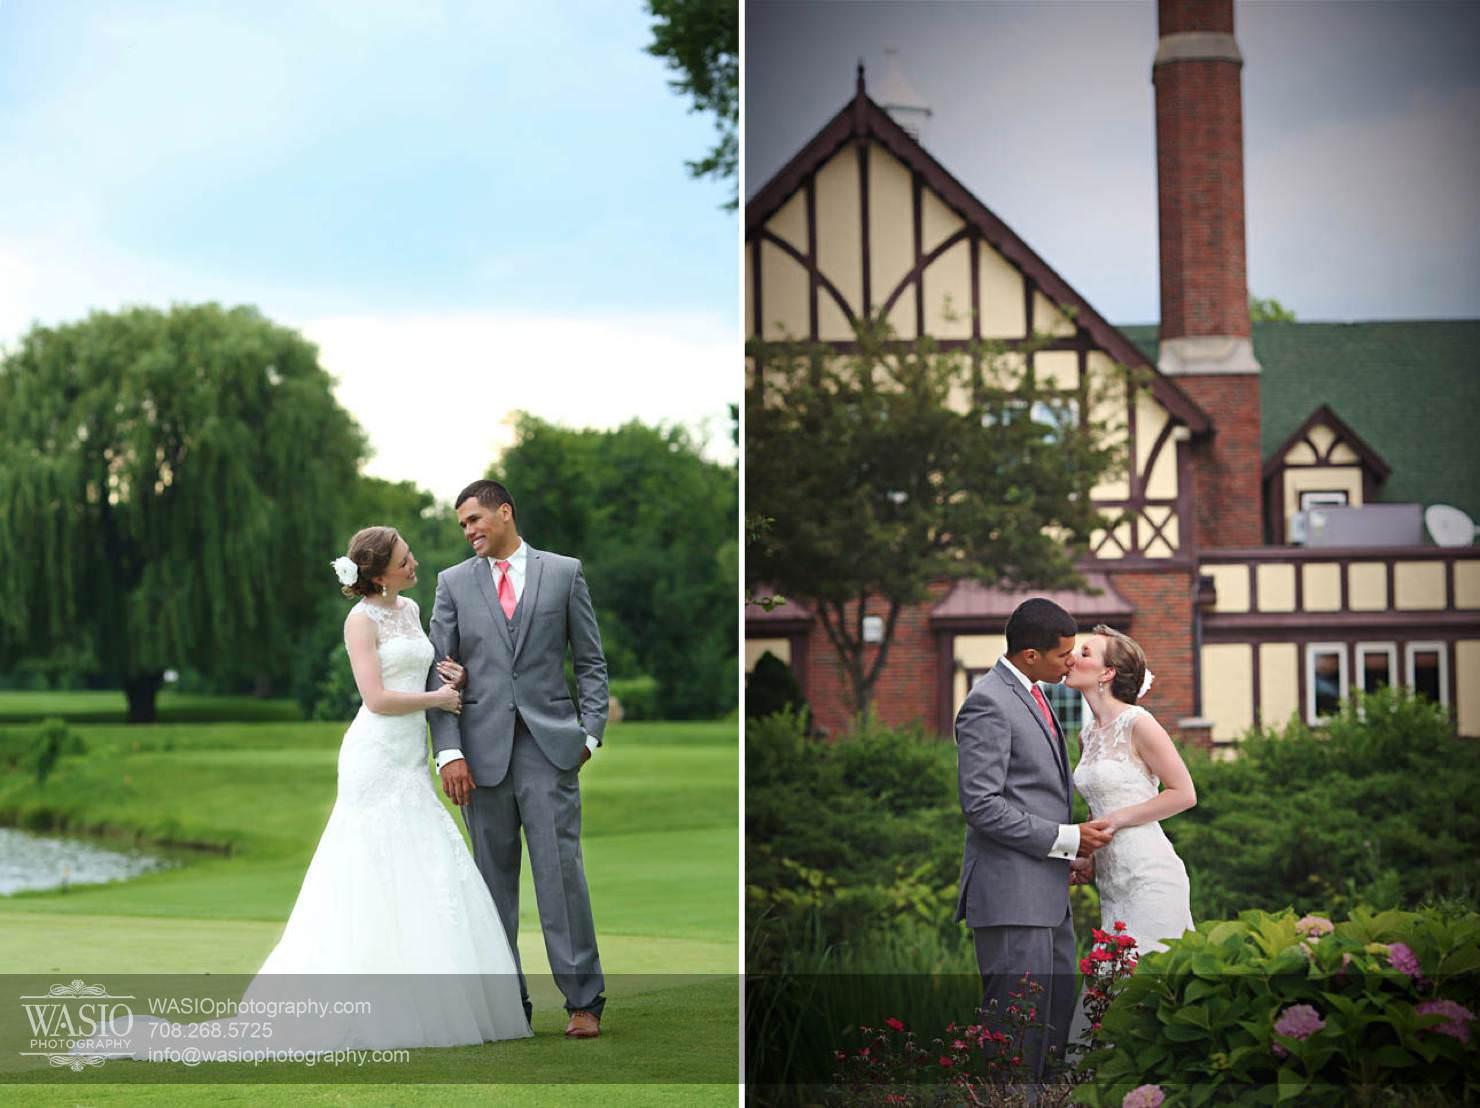 wedding-country-club-green-summer-chicago Chevy Chase Country Club Wedding - Elizabeth & Michael